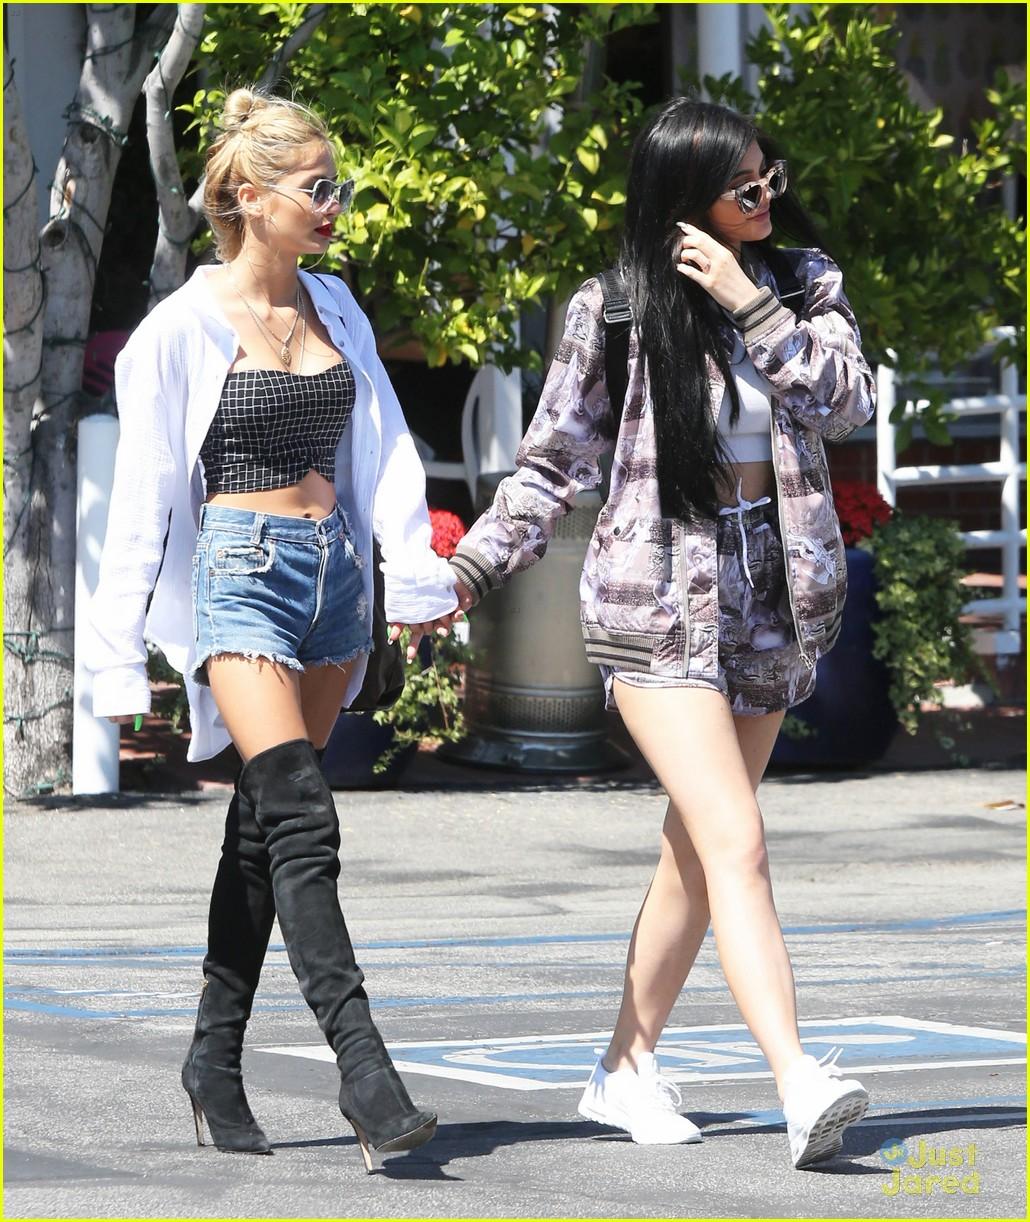 who is dating robert kardashian